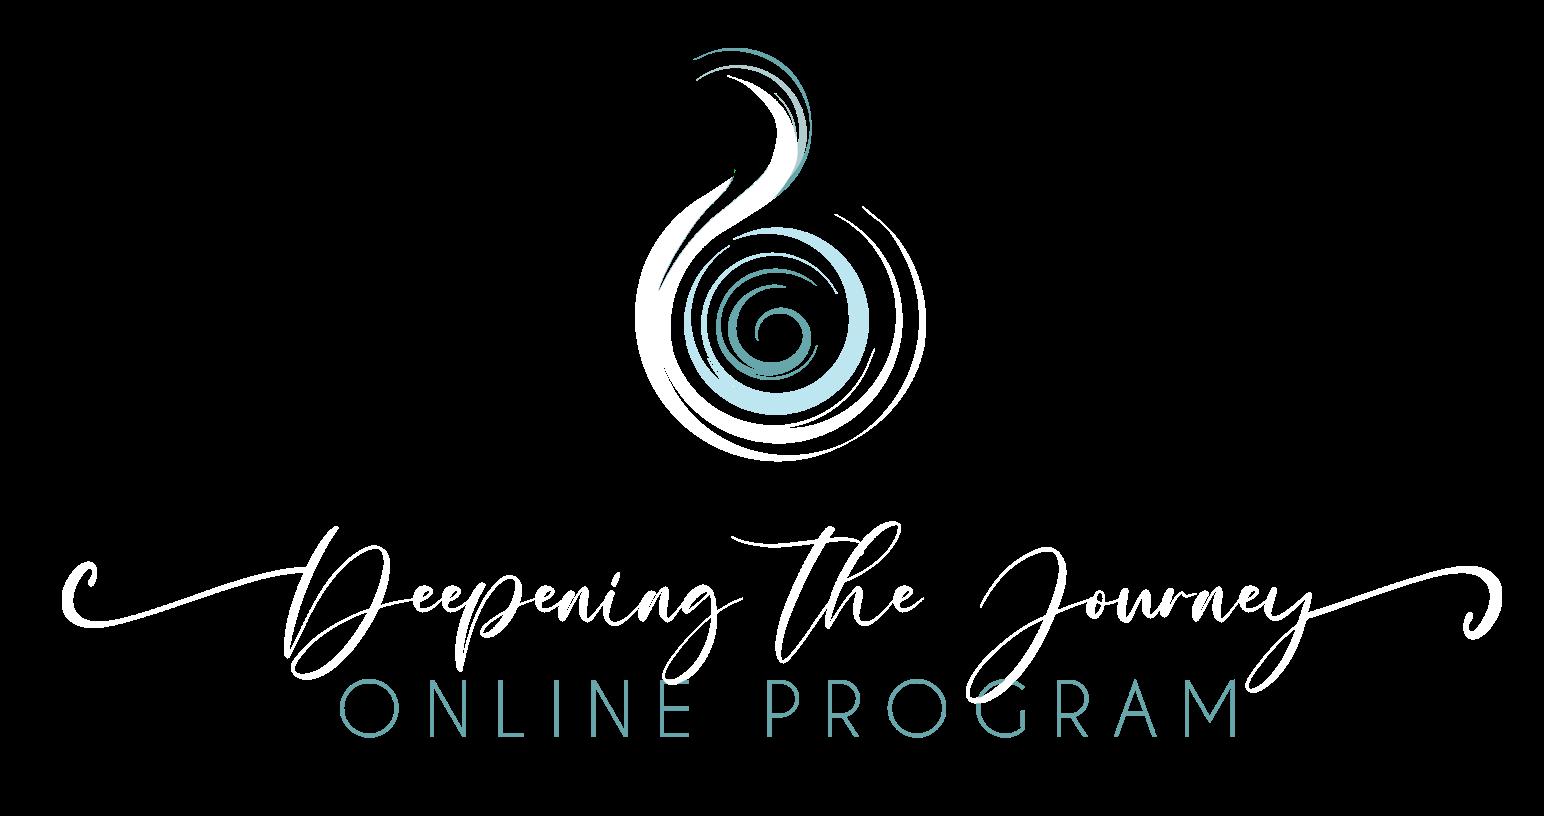 Deepening the Journey Online Program